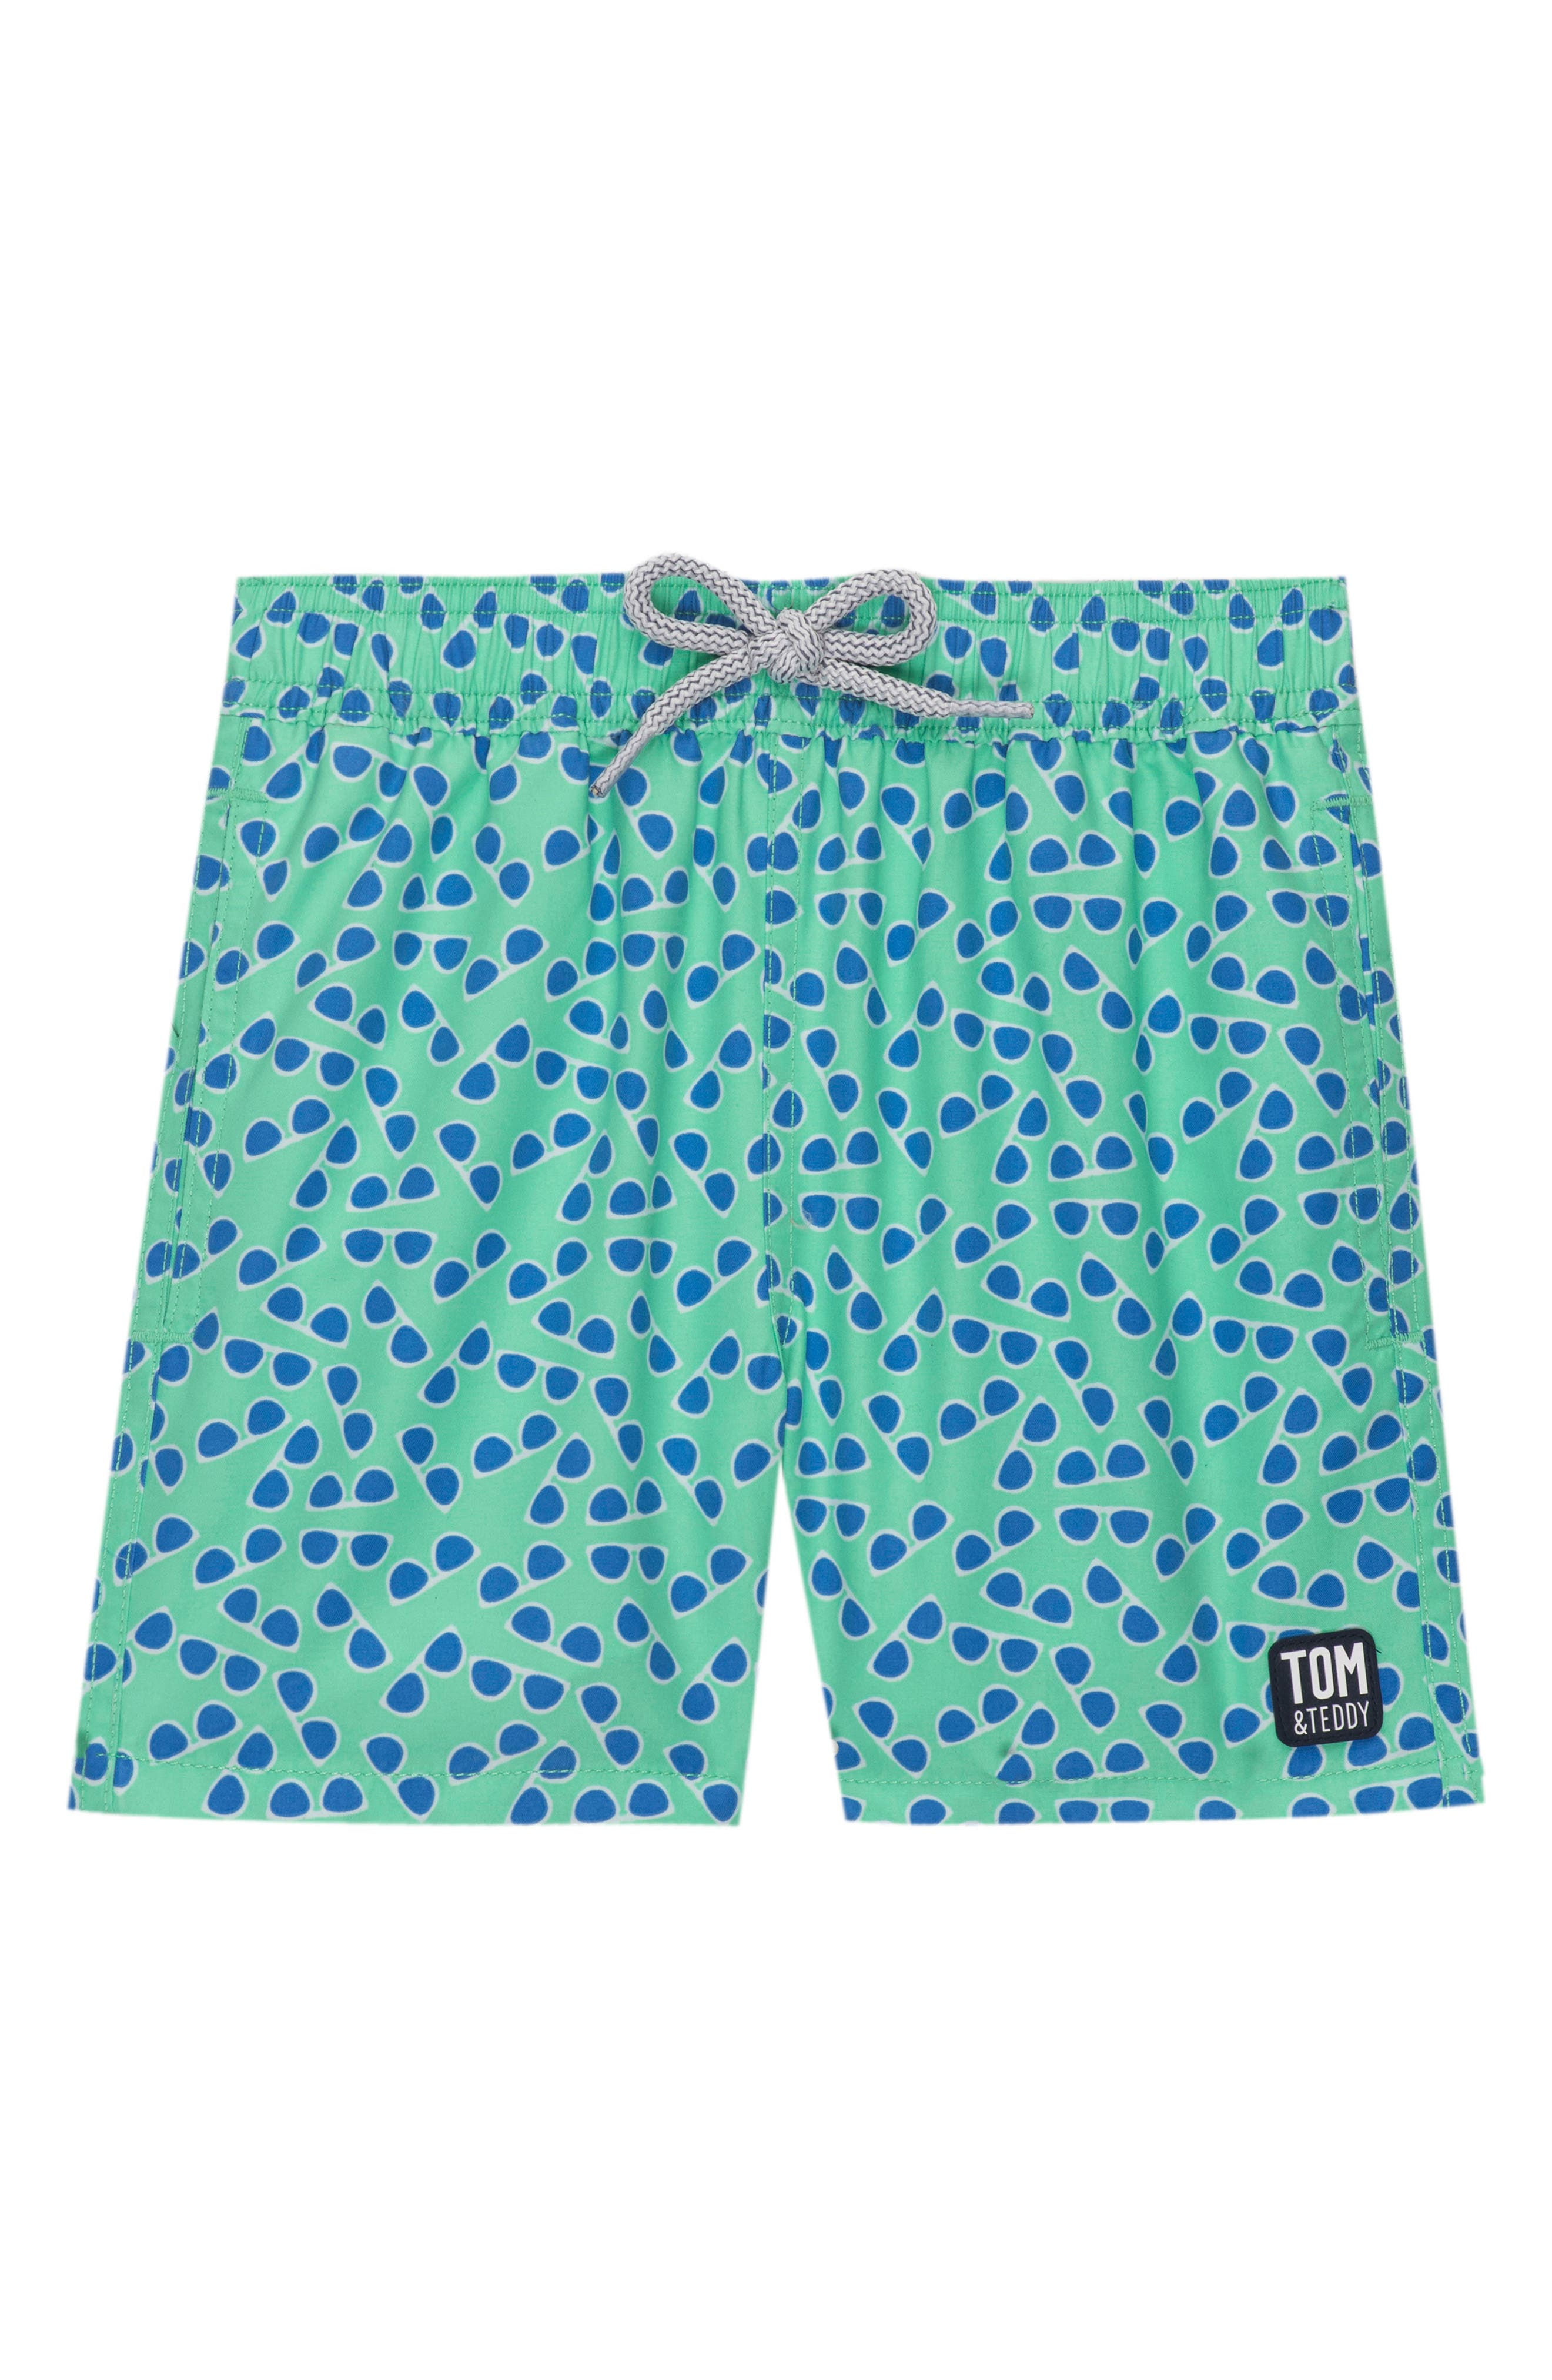 Tom & Teddy Sunglasses Print Swim Trunks (Toddler Boys, Little Boys & Big Boys)